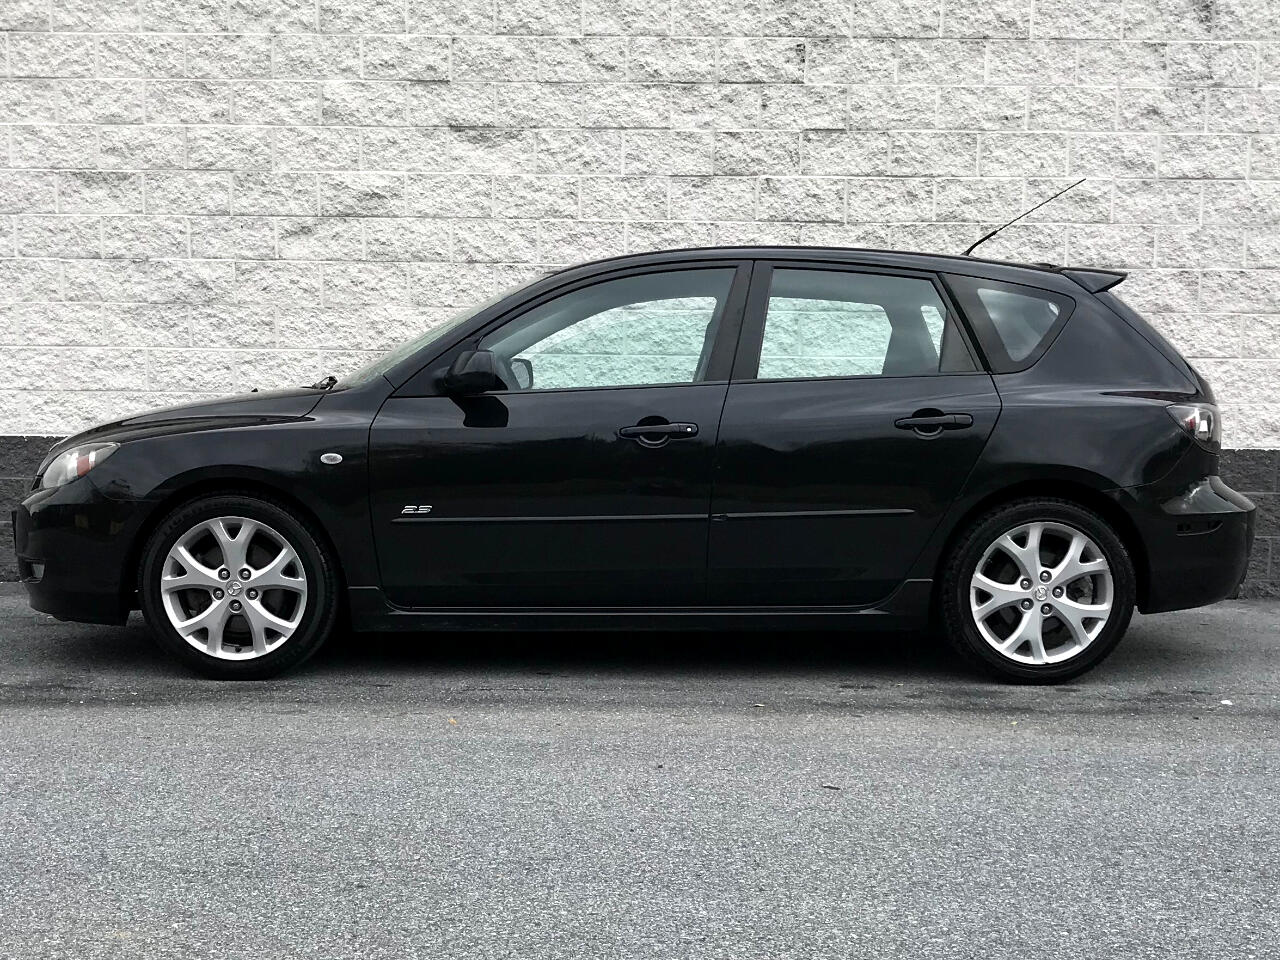 2007 Mazda MAZDA3 5dr HB Auto s Sport